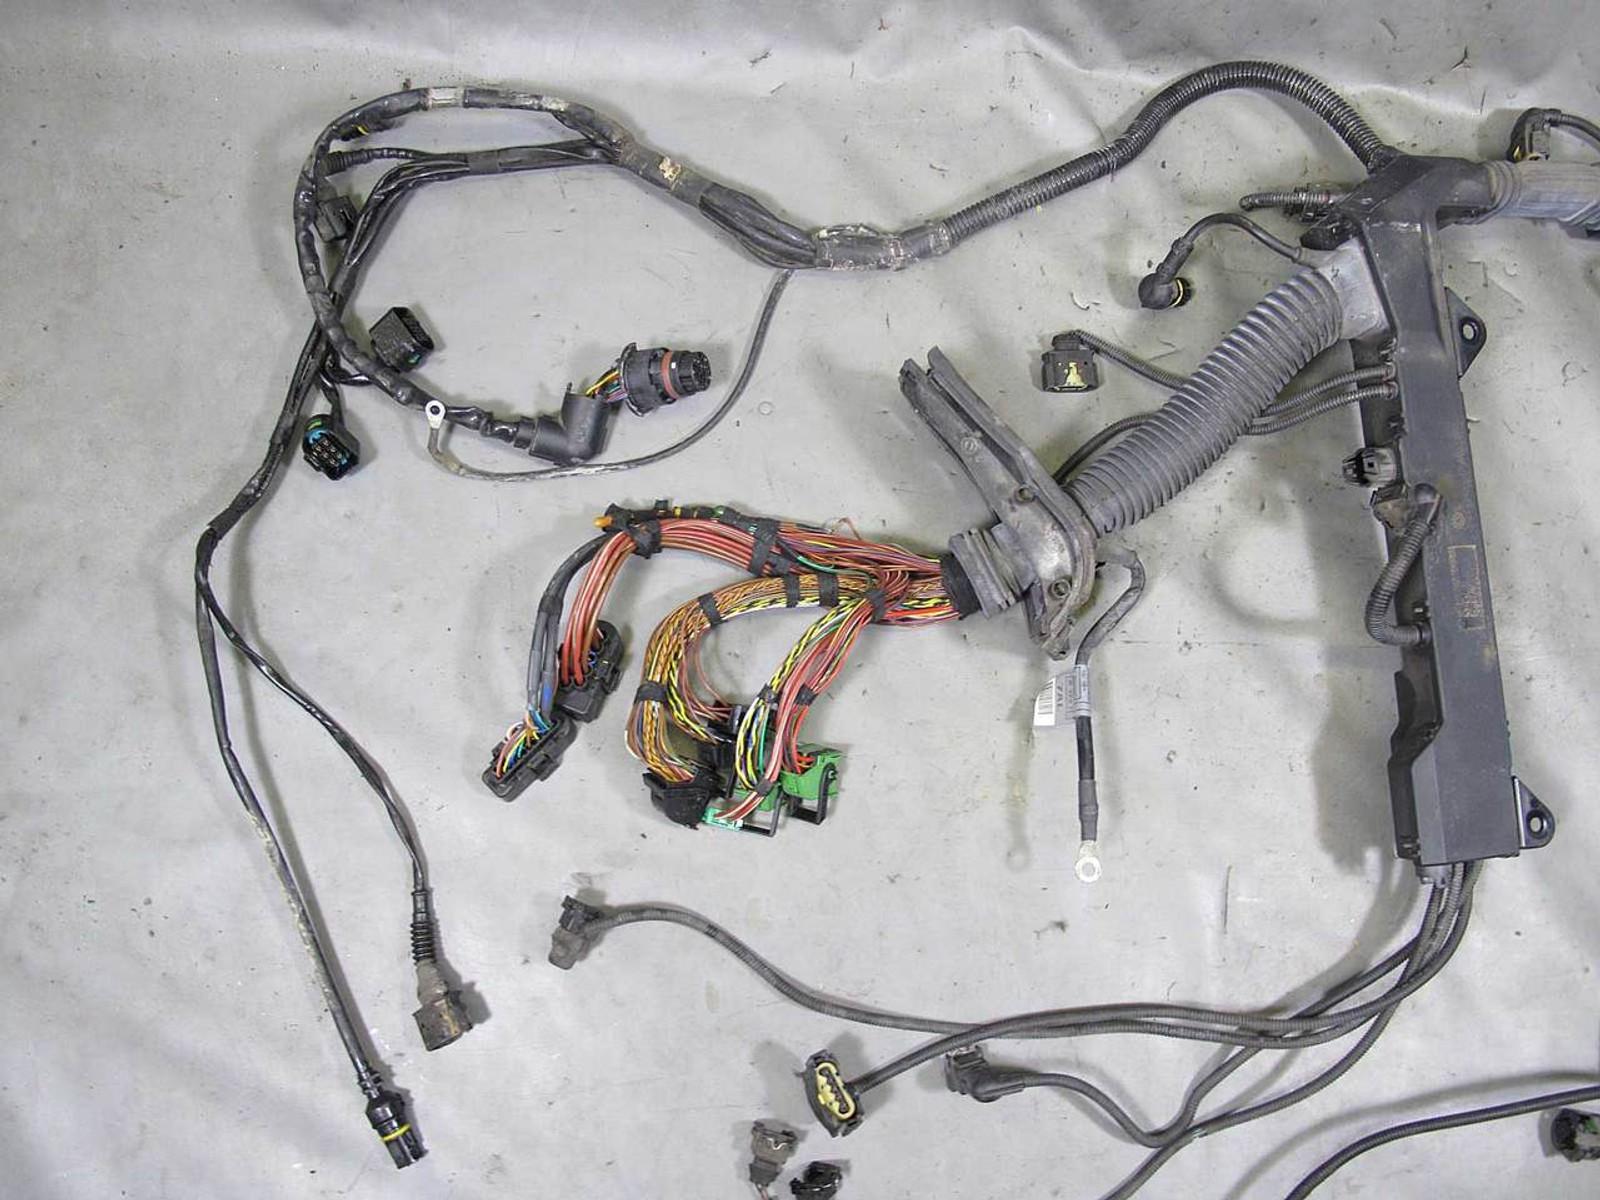 bmw e65 e66 745i 745il n62 v8 engine wiring harness w brokenbmw 745 wiring 8 [ 1280 x 960 Pixel ]